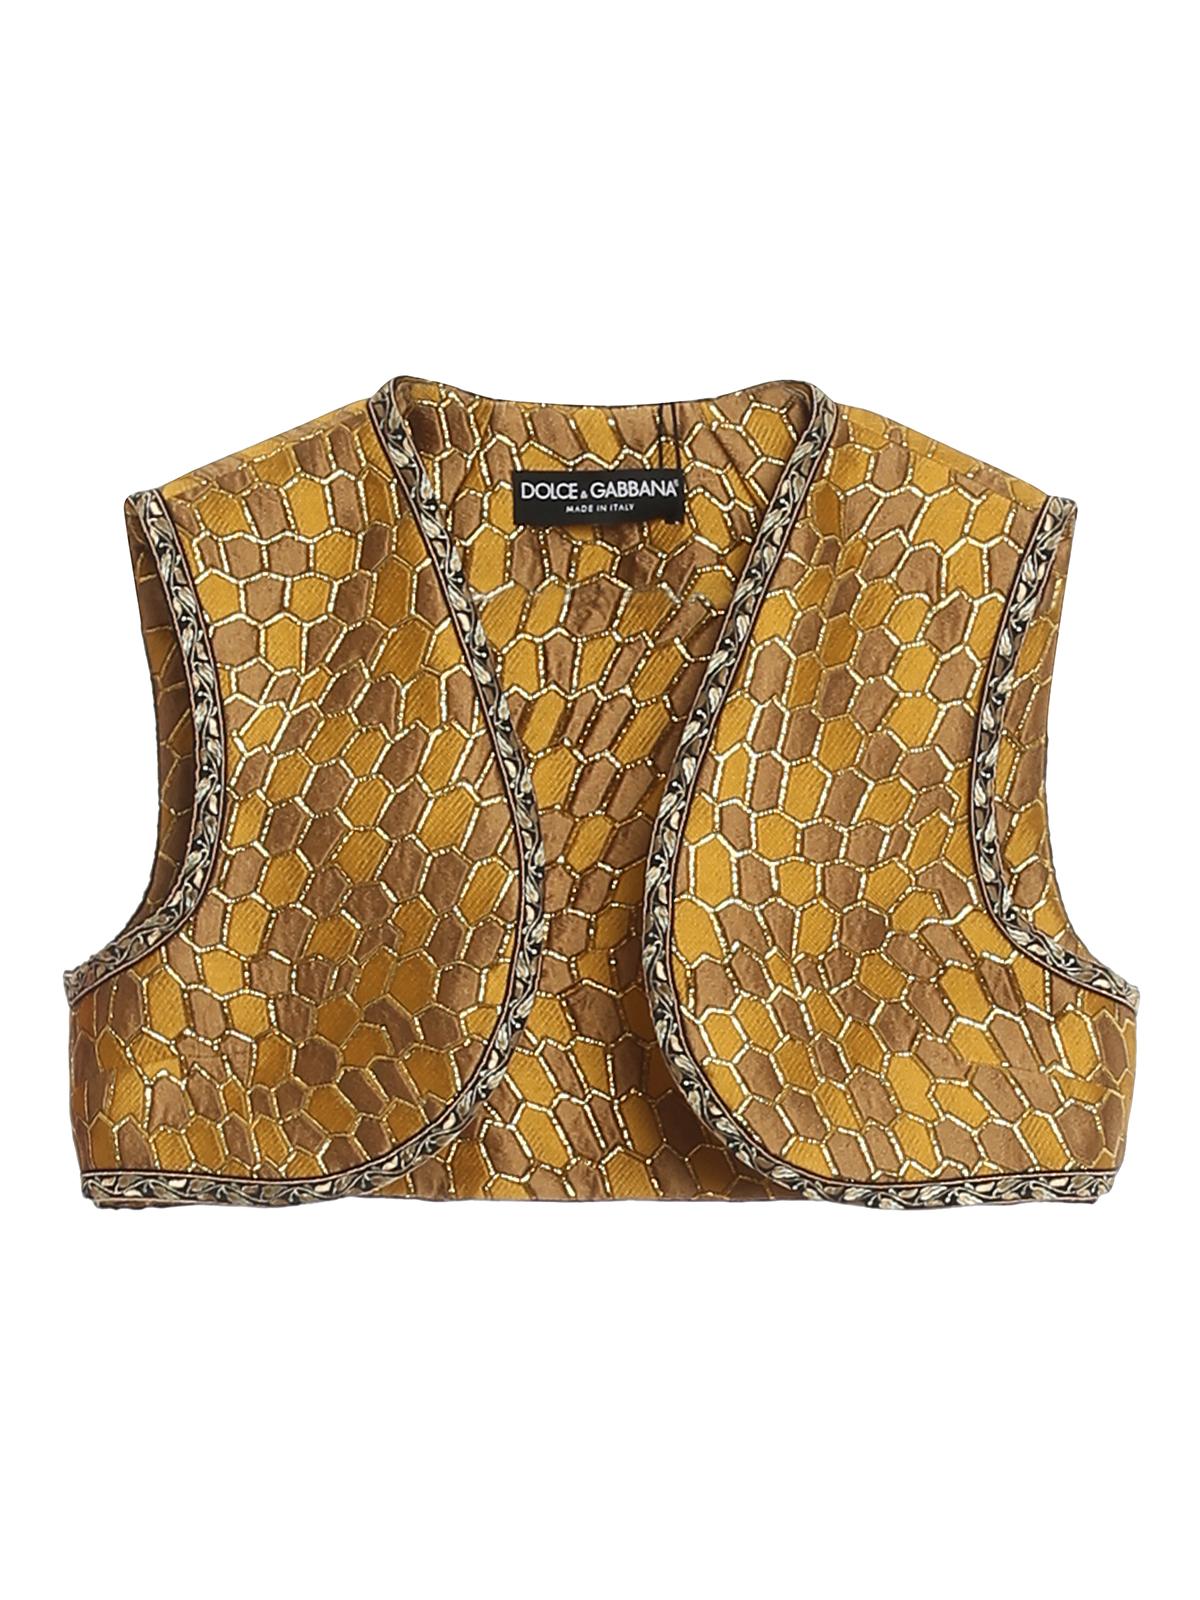 Dolce & Gabbana Vests HONEYCOMB PATTERNED GILET